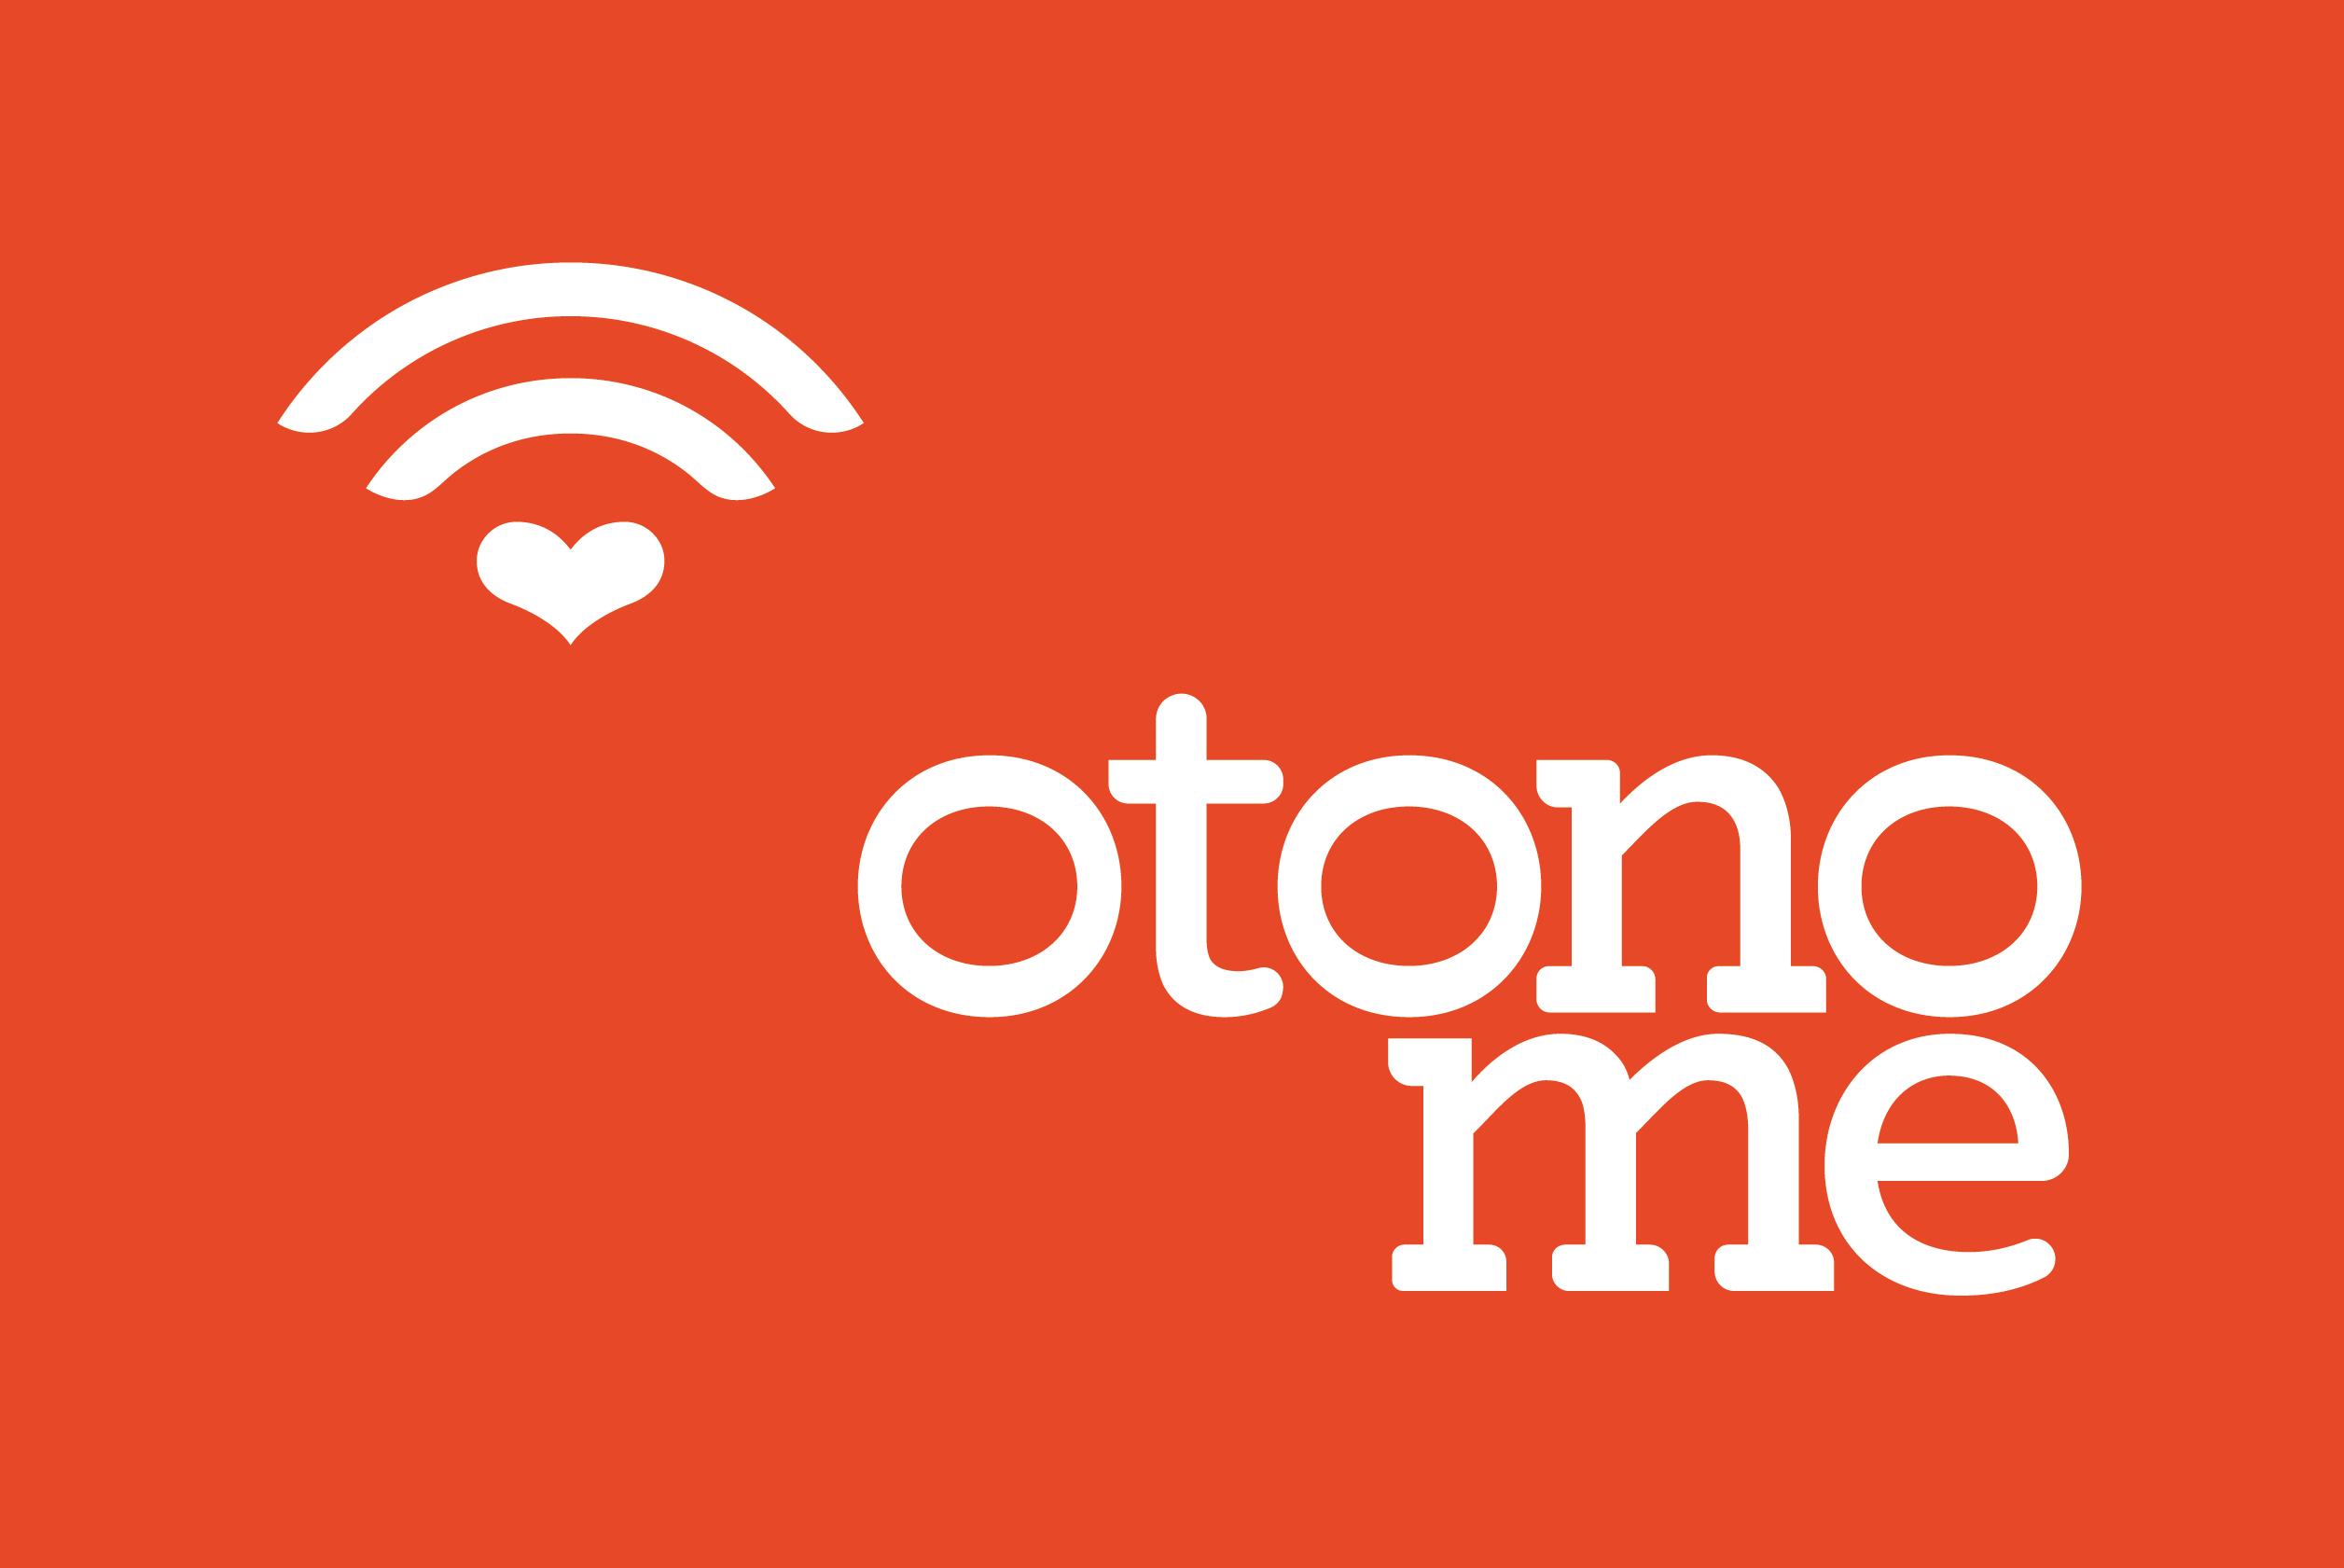 otono-me_full_Versions-02